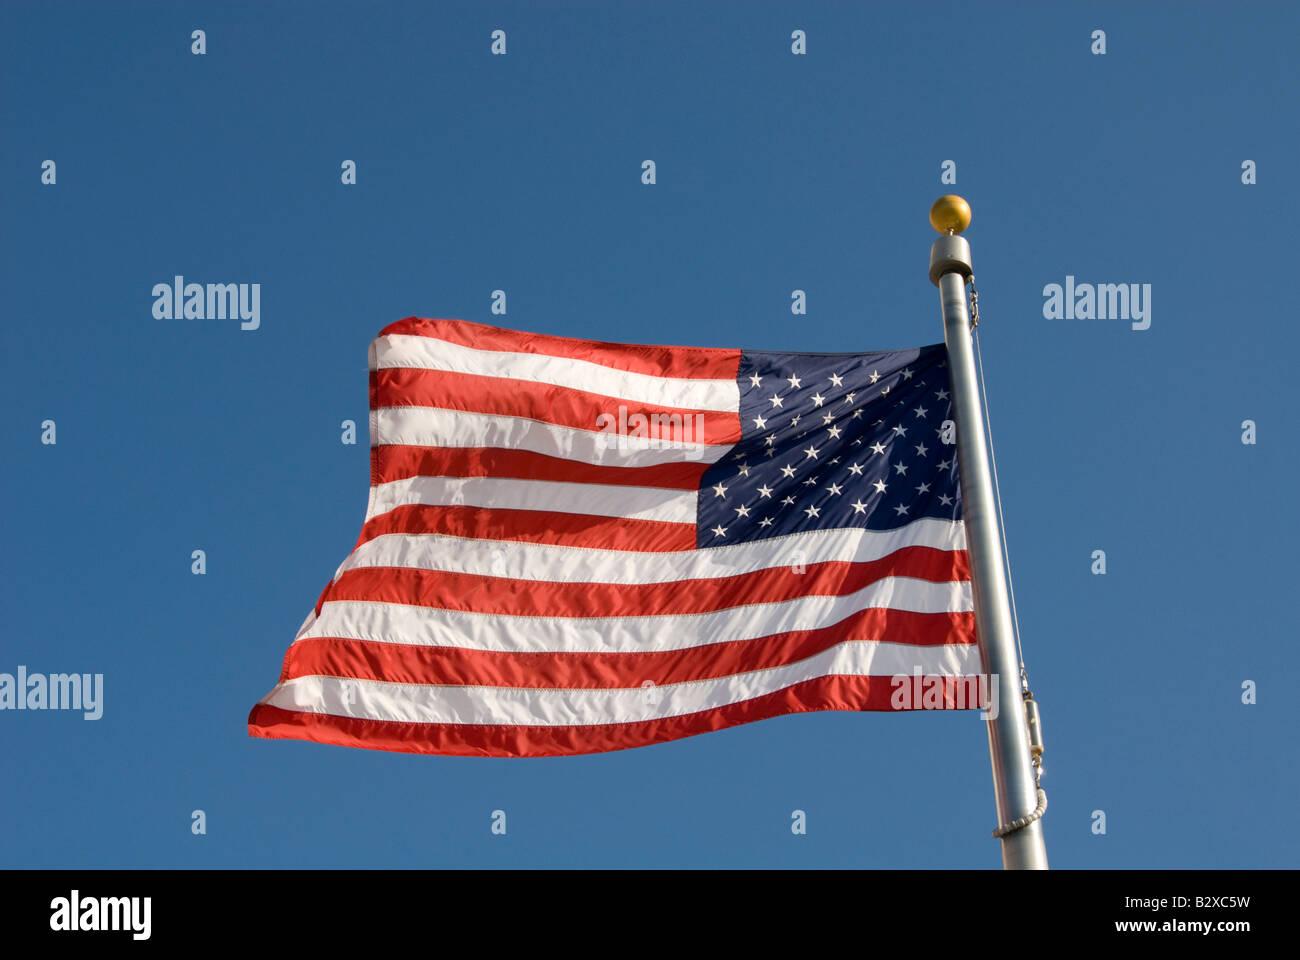 Washington DC USA American Flag at the Washington Monument Photo copyright Lee Foster Photo 2 washdc76060 - Stock Image